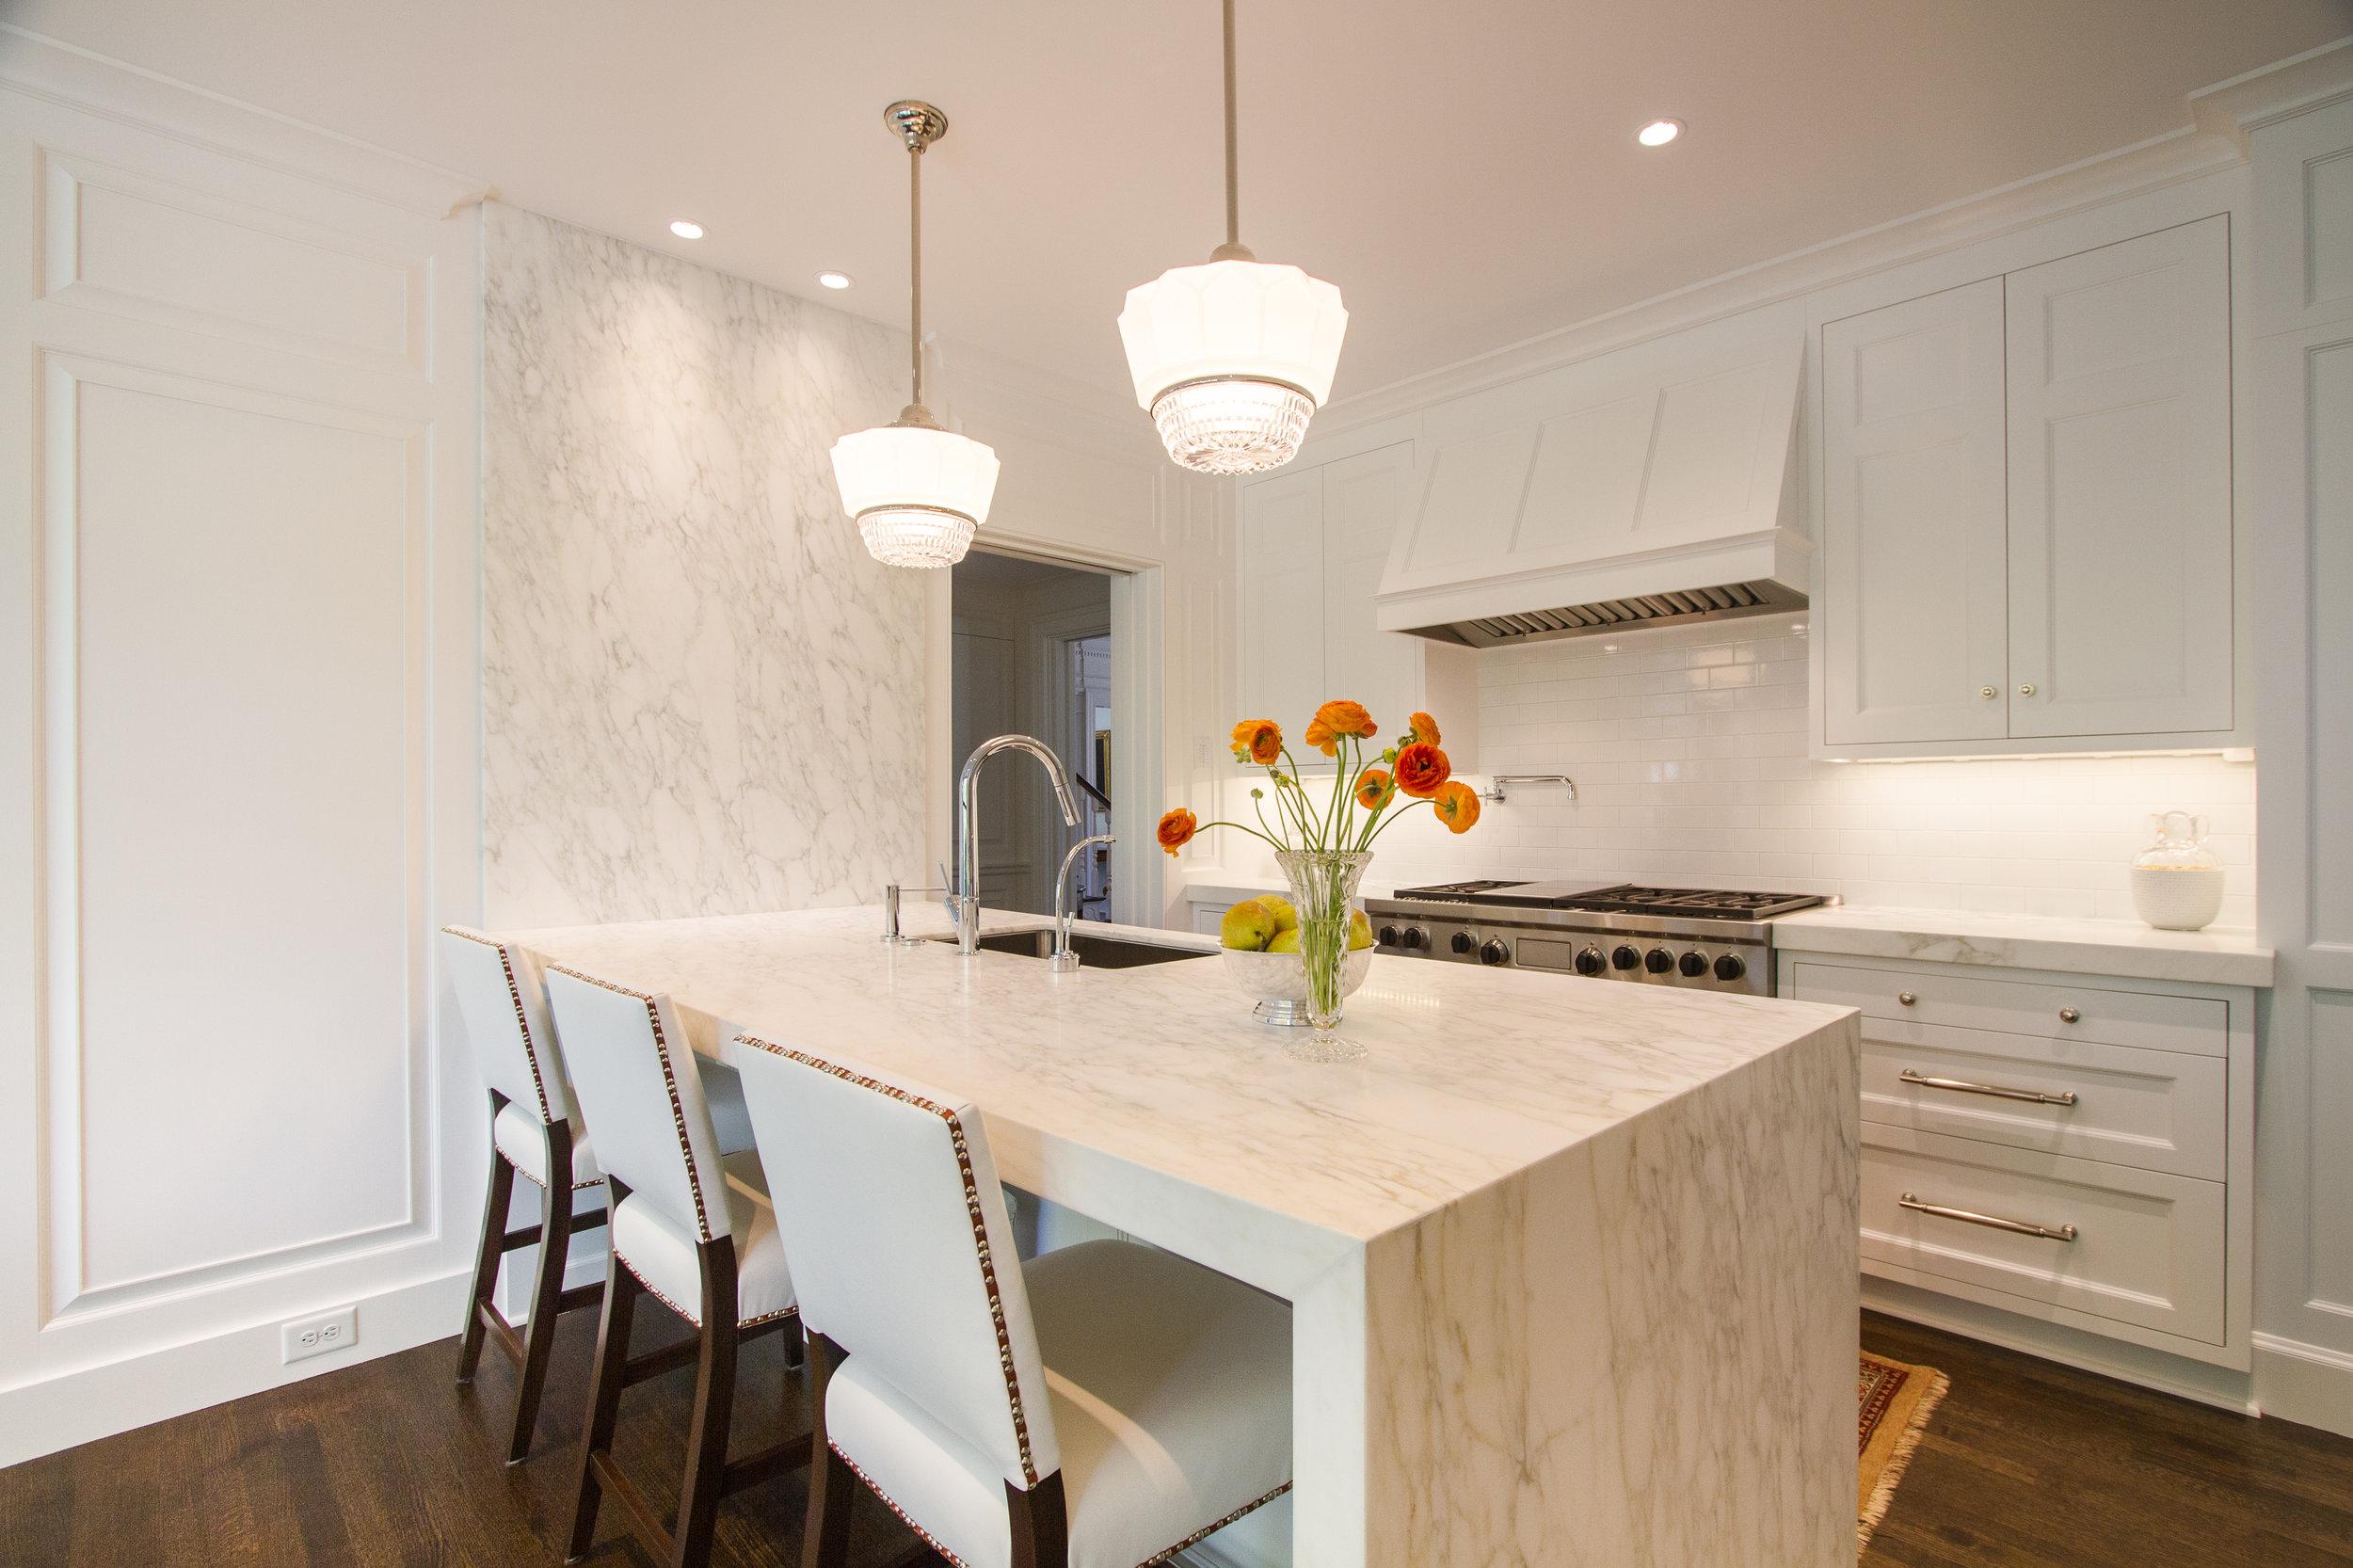 1930s Residence, Kitchen © Spellacy Schroeder Interiors 2017